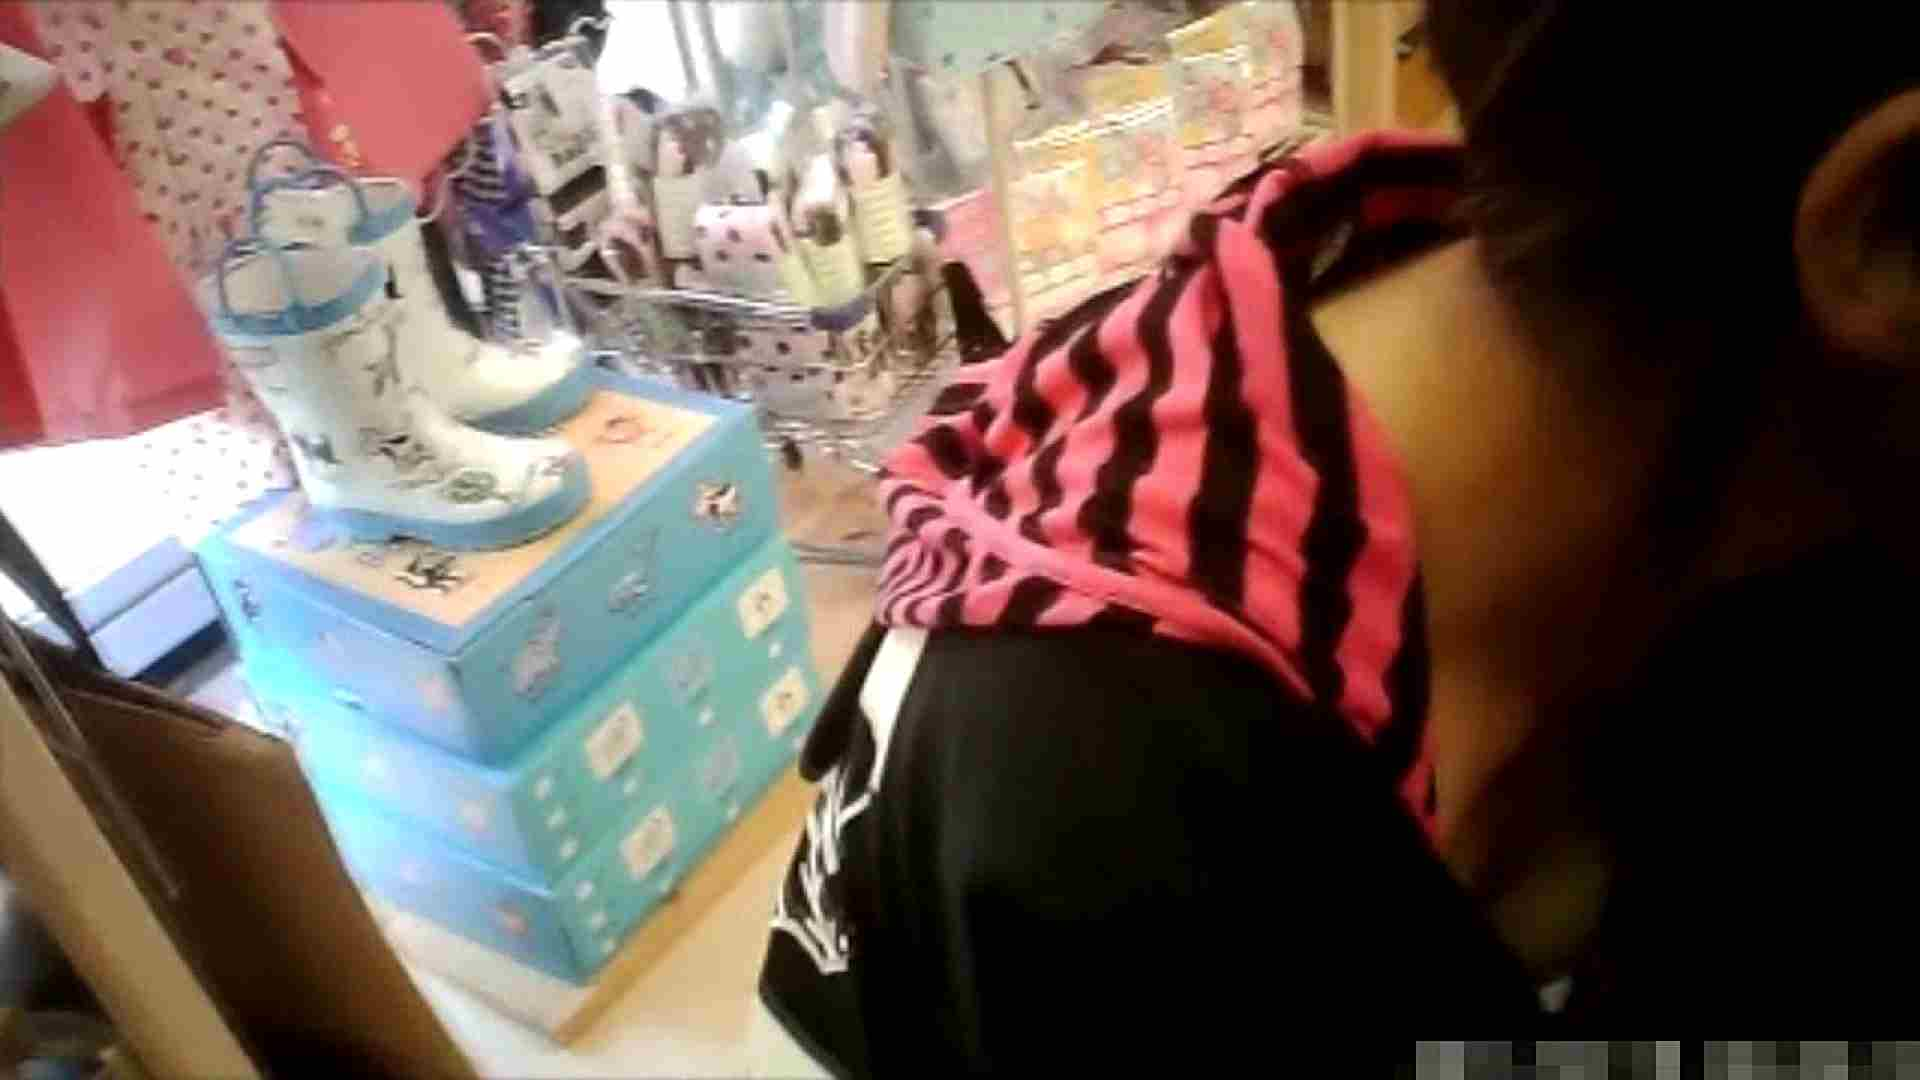 NO.6 雑貨屋で買い物中のガーリーな女の子 チラ  100連発 78